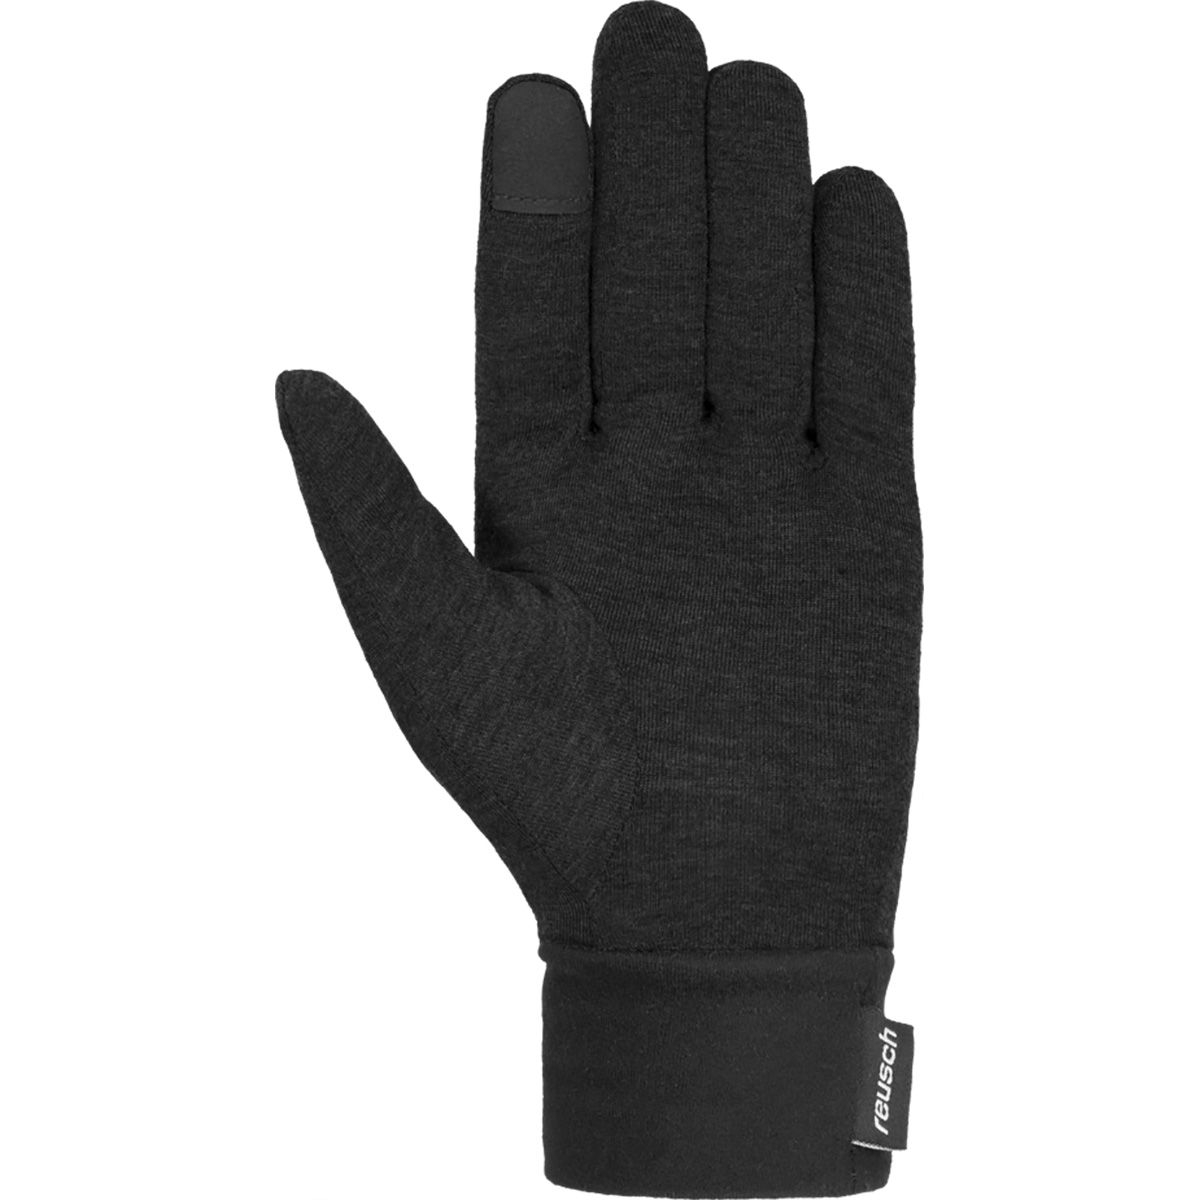 Reusch Primaloft Silk Liner Unterziehhandschuhe schwarz